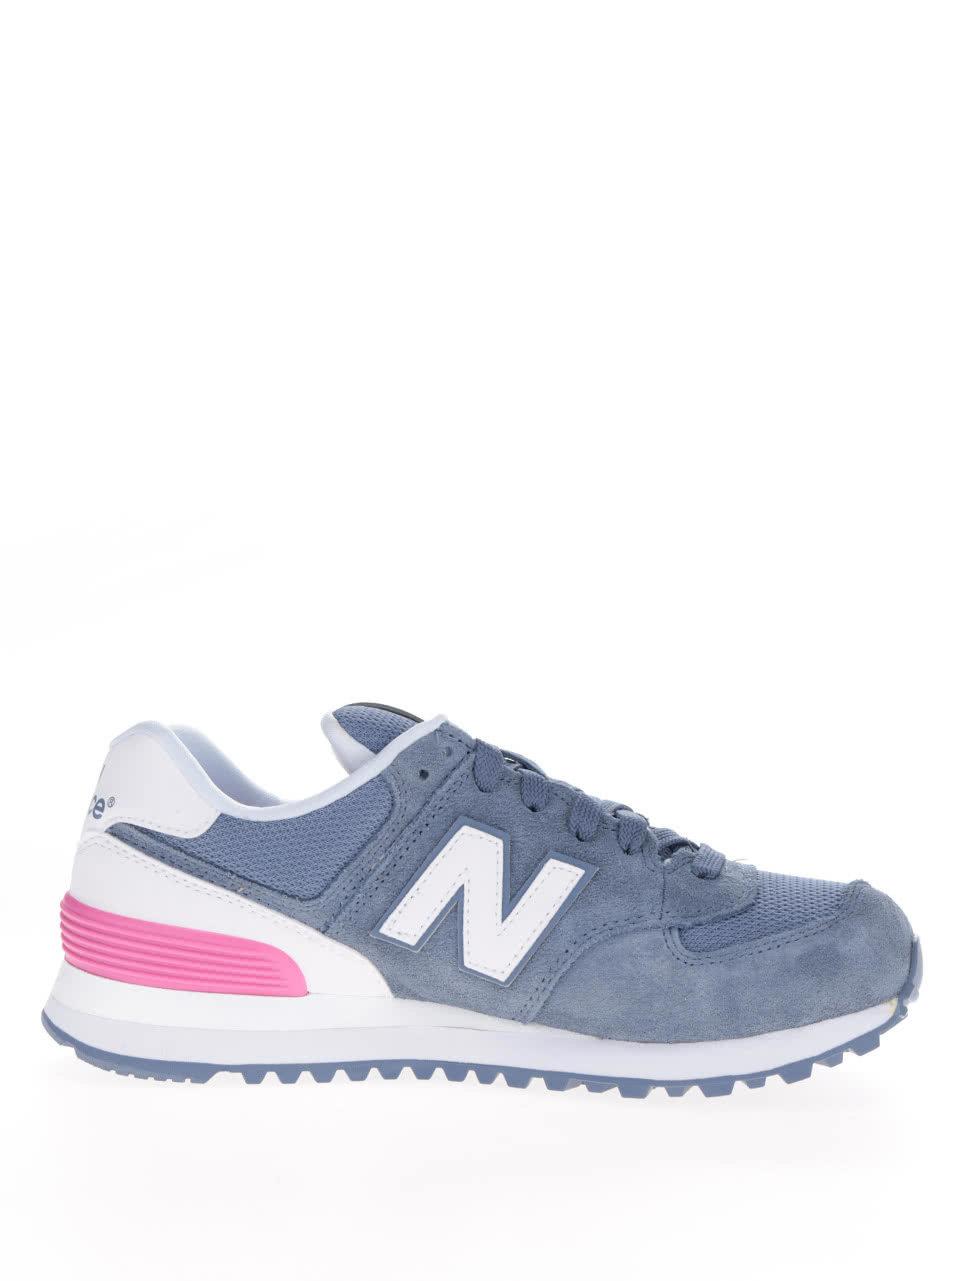 Bílo-modré dámské semišové tenisky New Balance ... c29492ab91